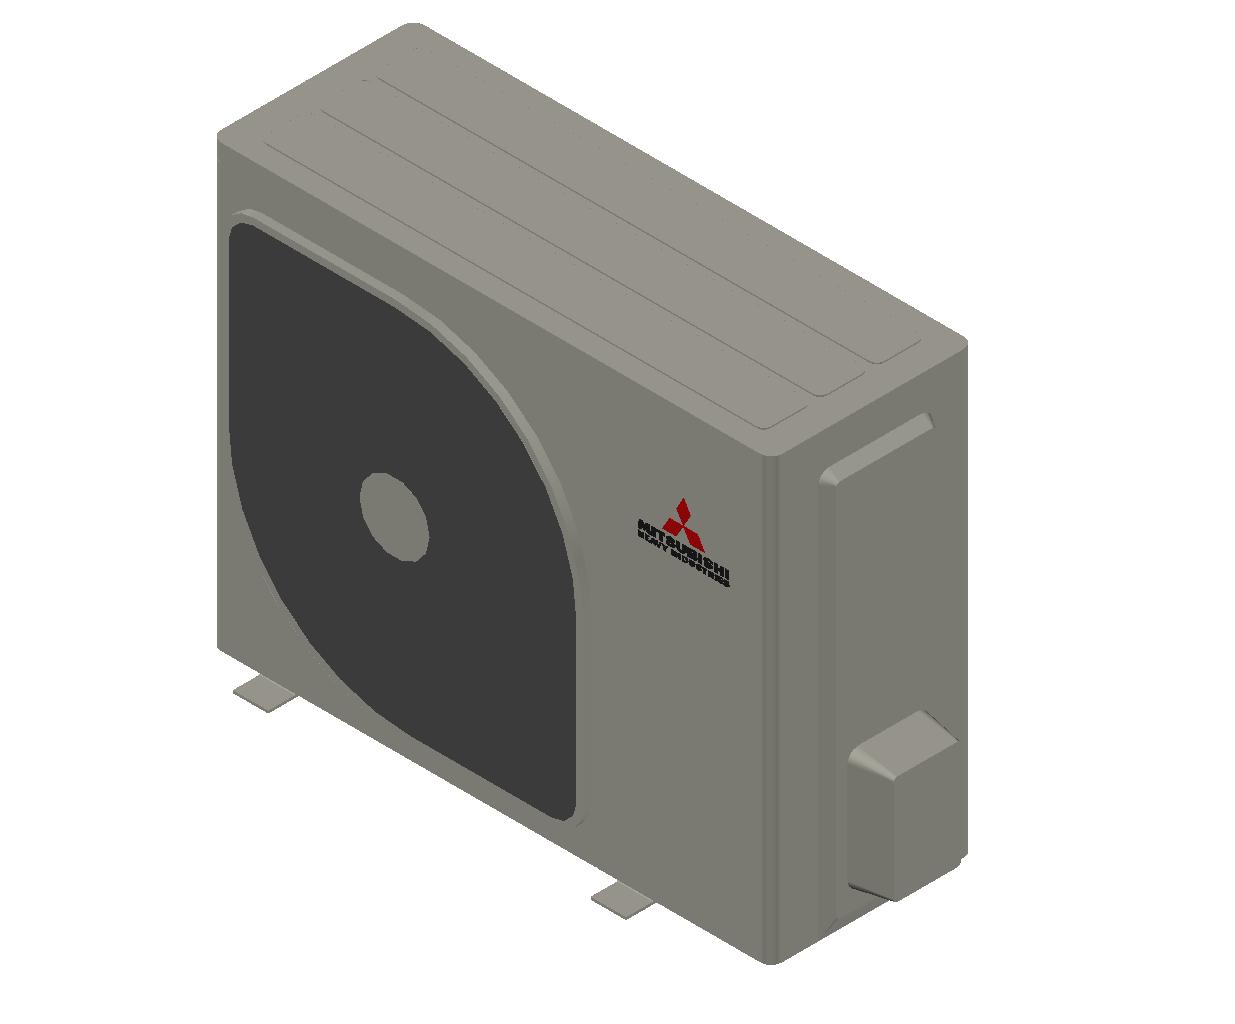 HC_Heat Pump_MEPcontent_Mitsubishi Heavy Industries_PAC-RAC_SRC25ZSX-W_INT-EN.dwg